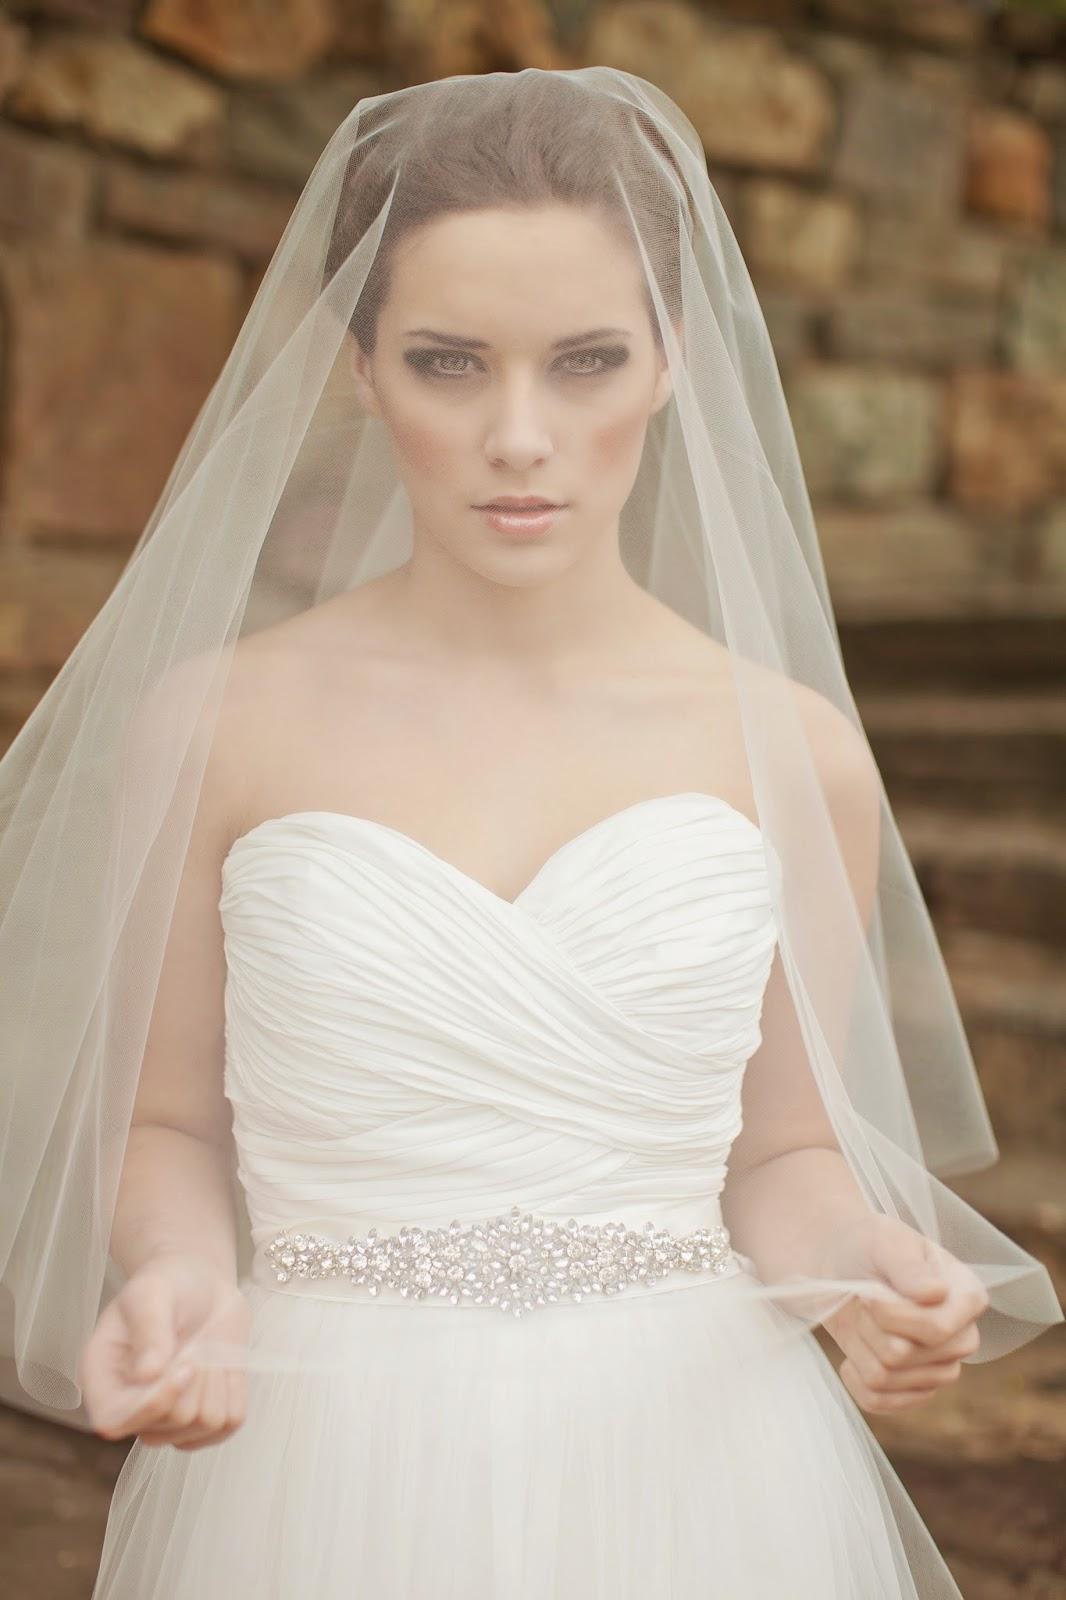 corrine elbow length circle veil httpswwwetsycomlisting155426773 wedding veil circle veil drop veil elbowrefshop_home_active_4